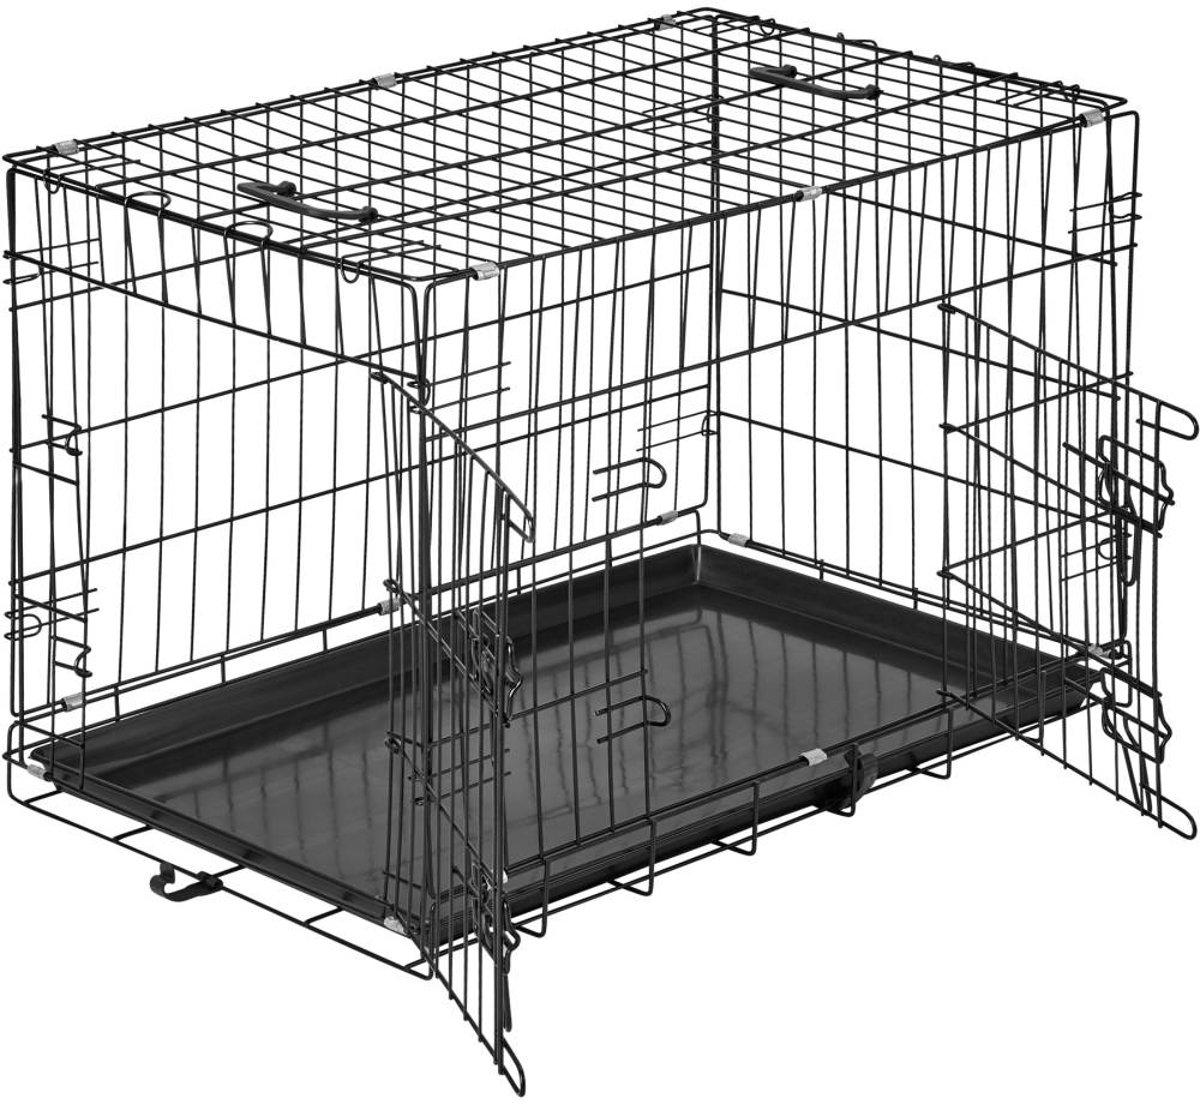 TecTake - Hondenkooi traliebox 76 x 47 x 51 cm - 402294 kopen